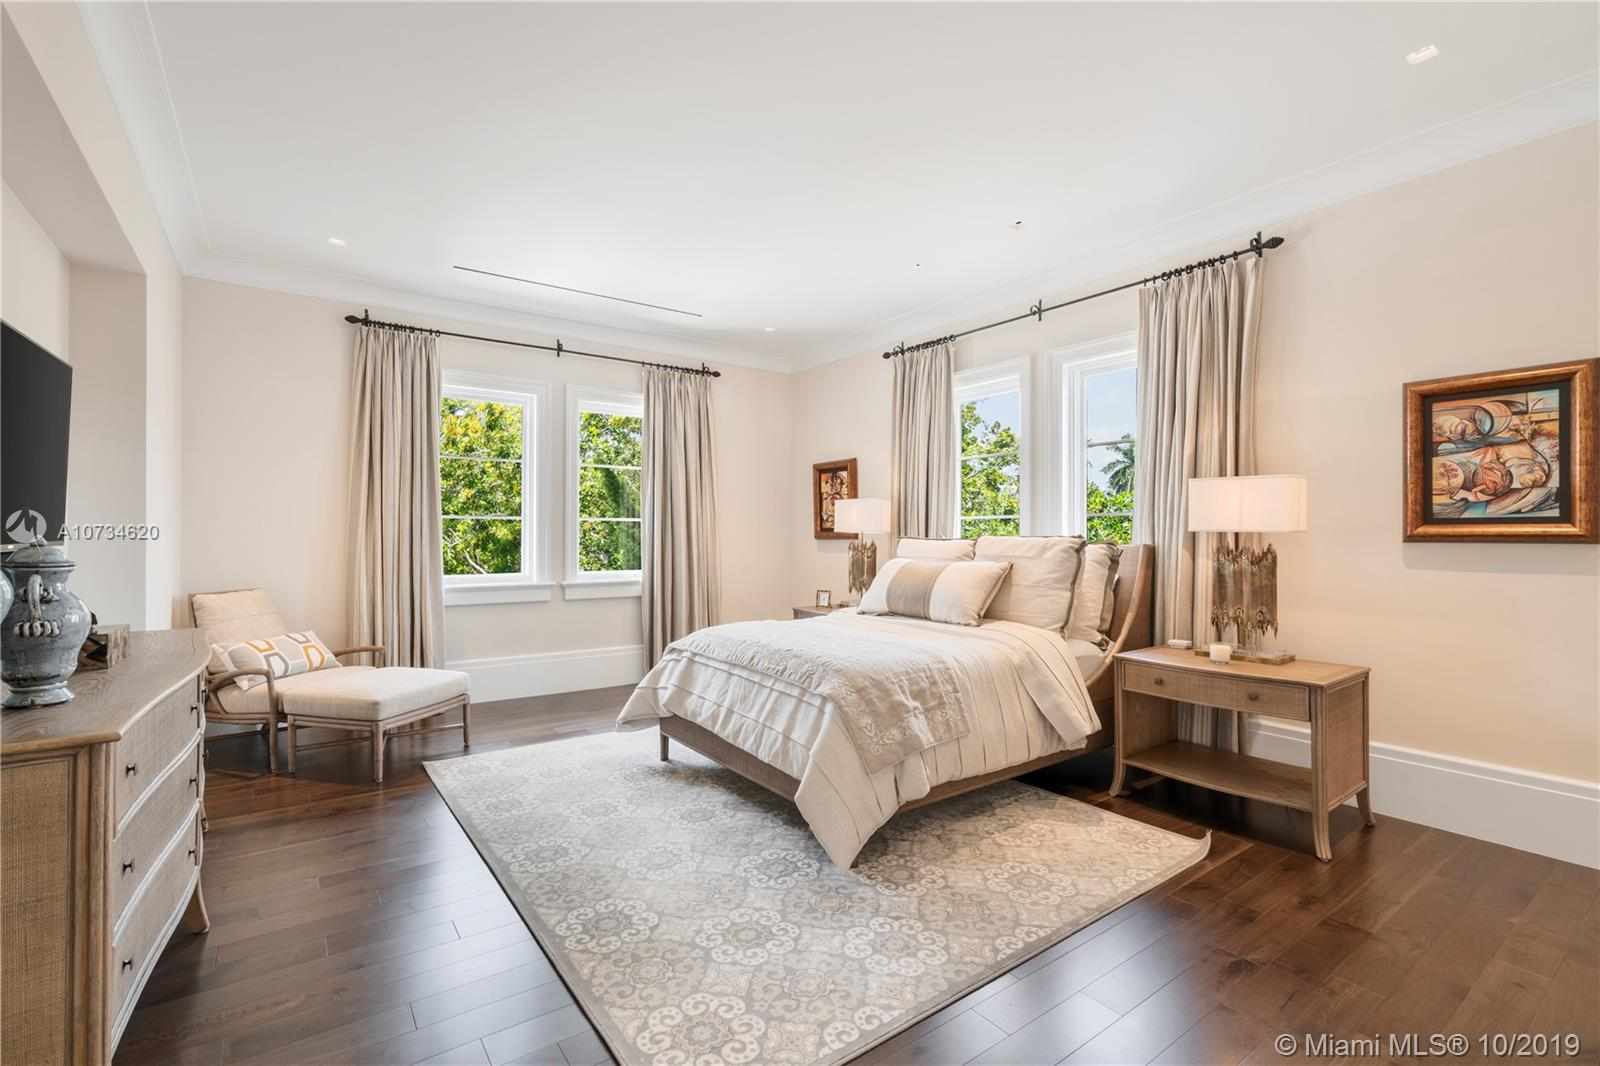 Homes for Sale in Zip Code 33156